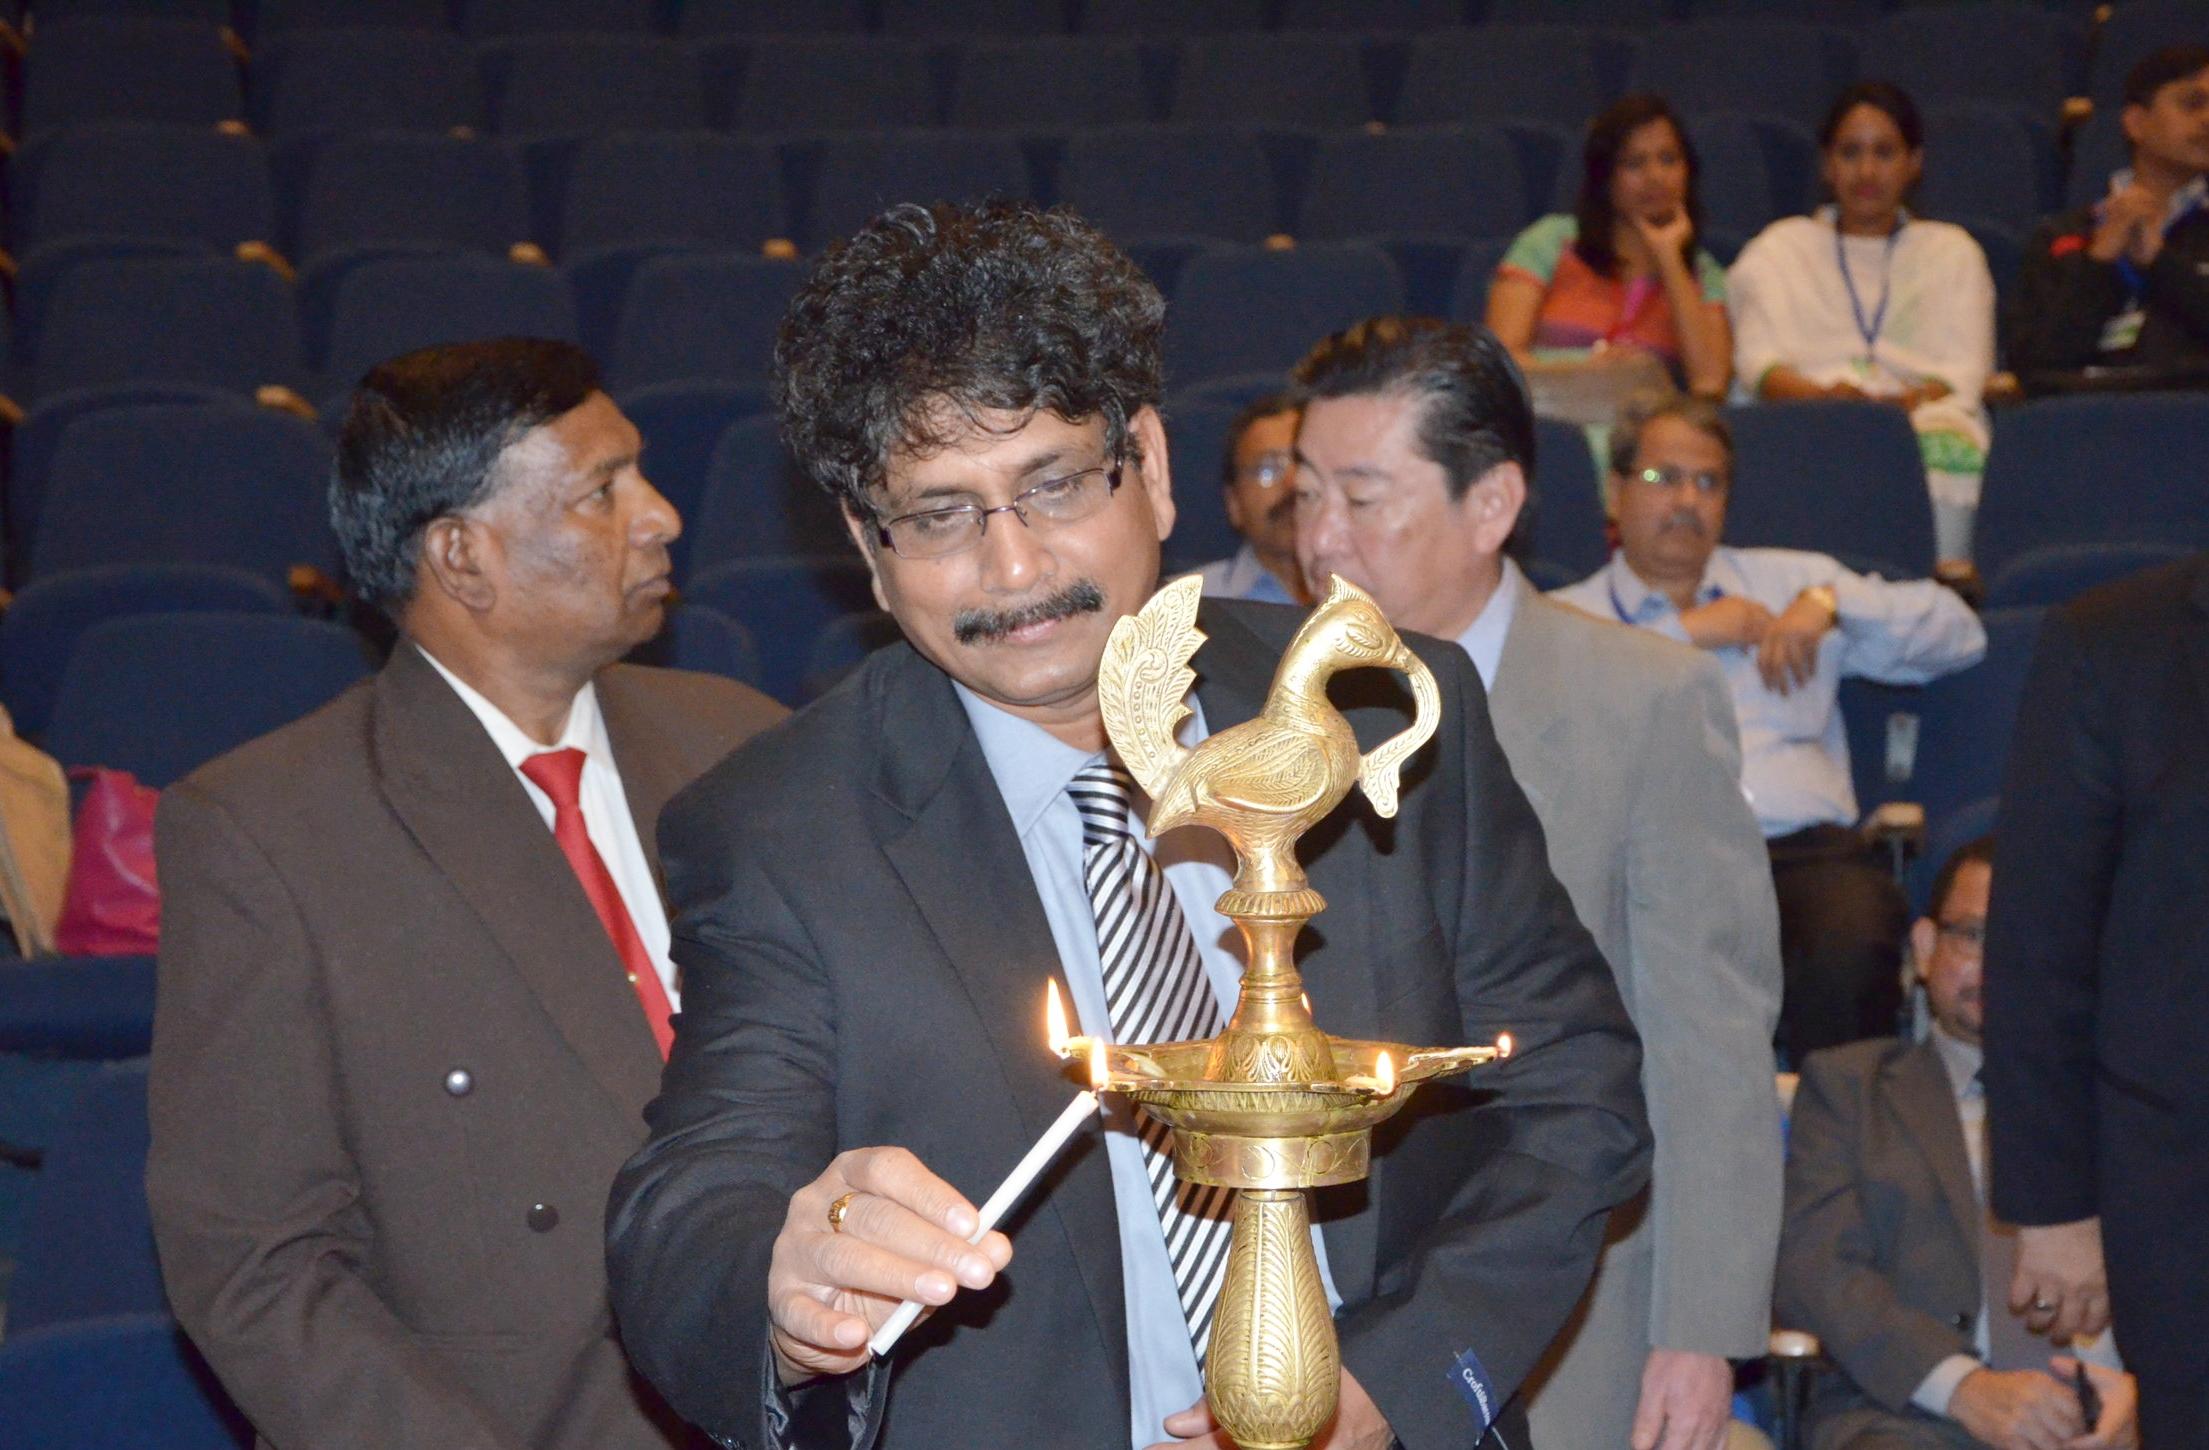 Rajesh Jugulum, PhD